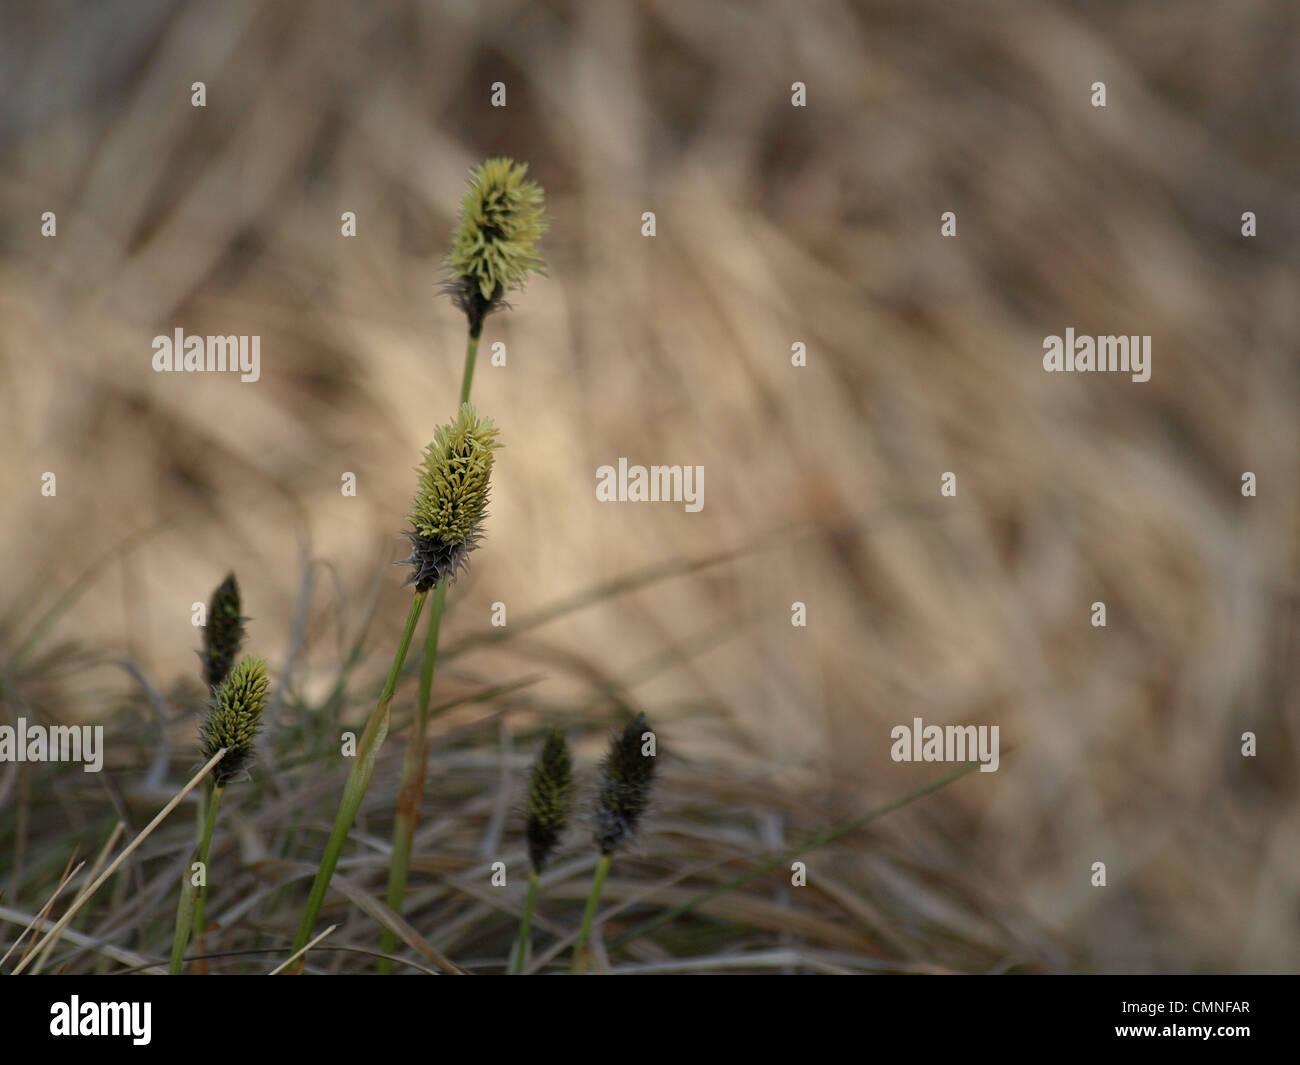 Florescence desde cola de Liebre / Eriophorum vaginatum césped de Algodón / Scheiden-Wollgras Foto de stock